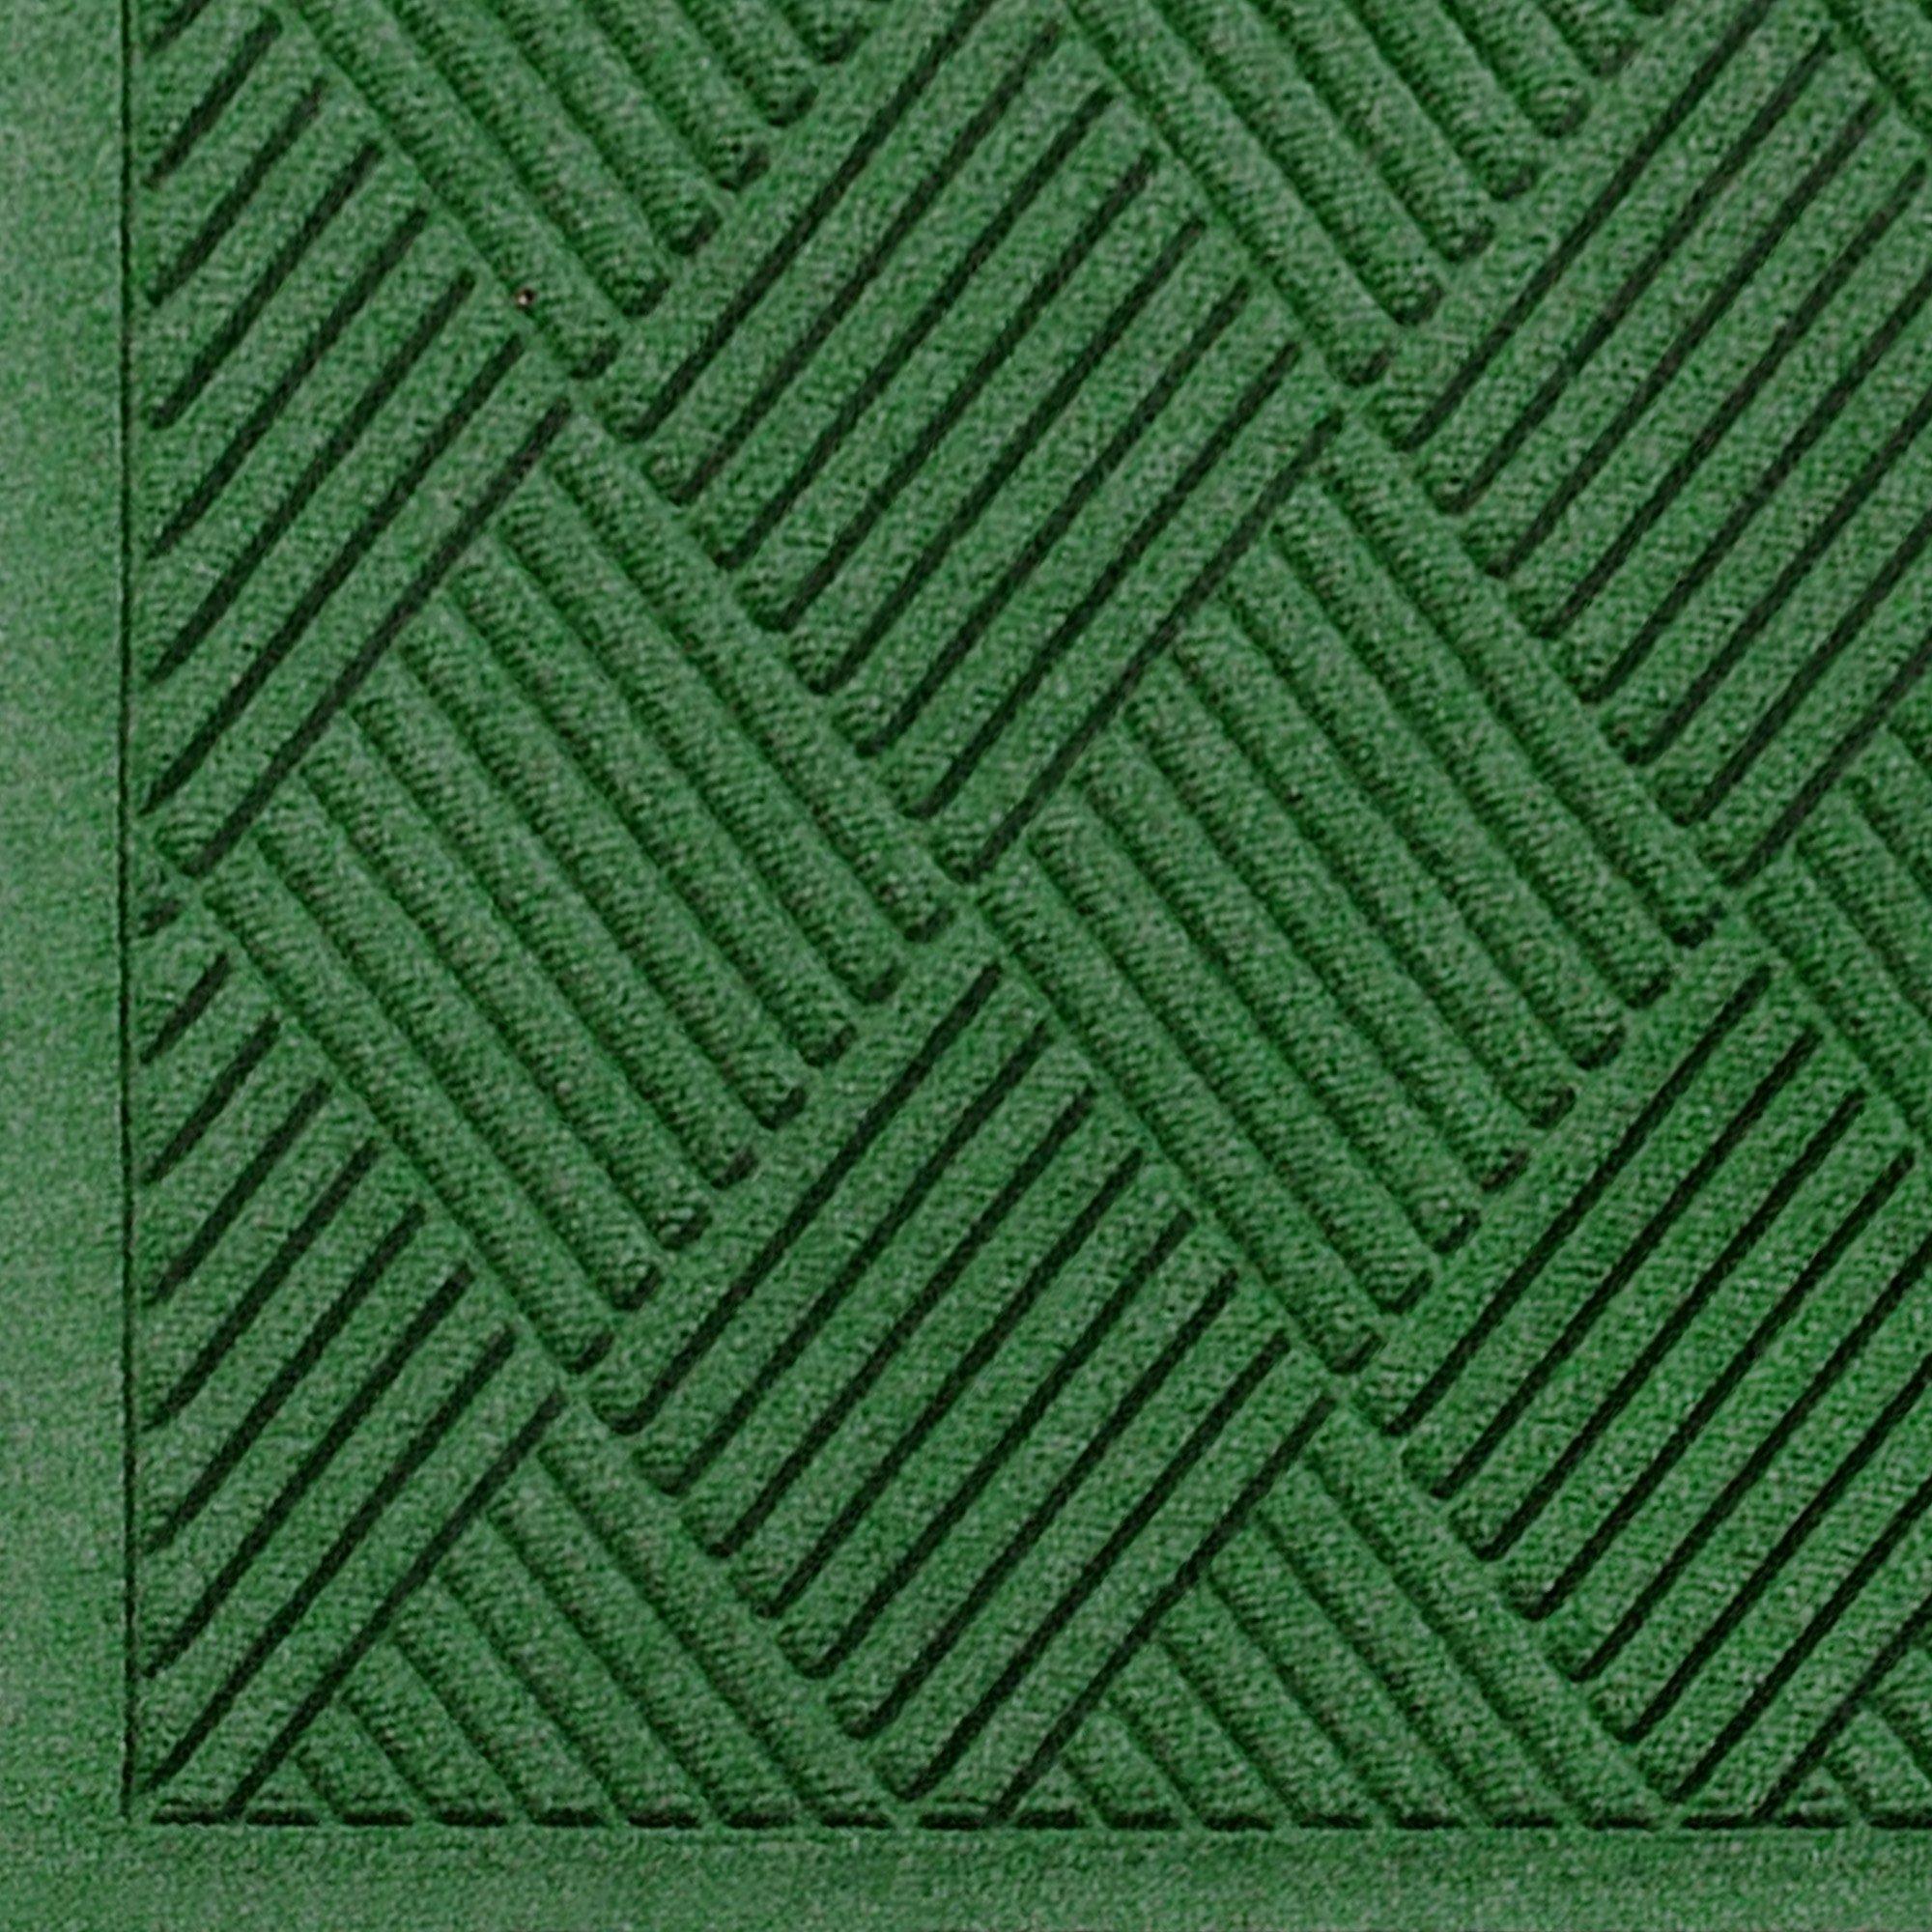 Andersen 221 Waterhog Fashion Diamond Polypropylene Fiber Entrance Indoor Floor Mat, SBR Rubber Backing, 12.2' Length x 4' Width, 1/4'' Thick, Light Green by The Andersen Company